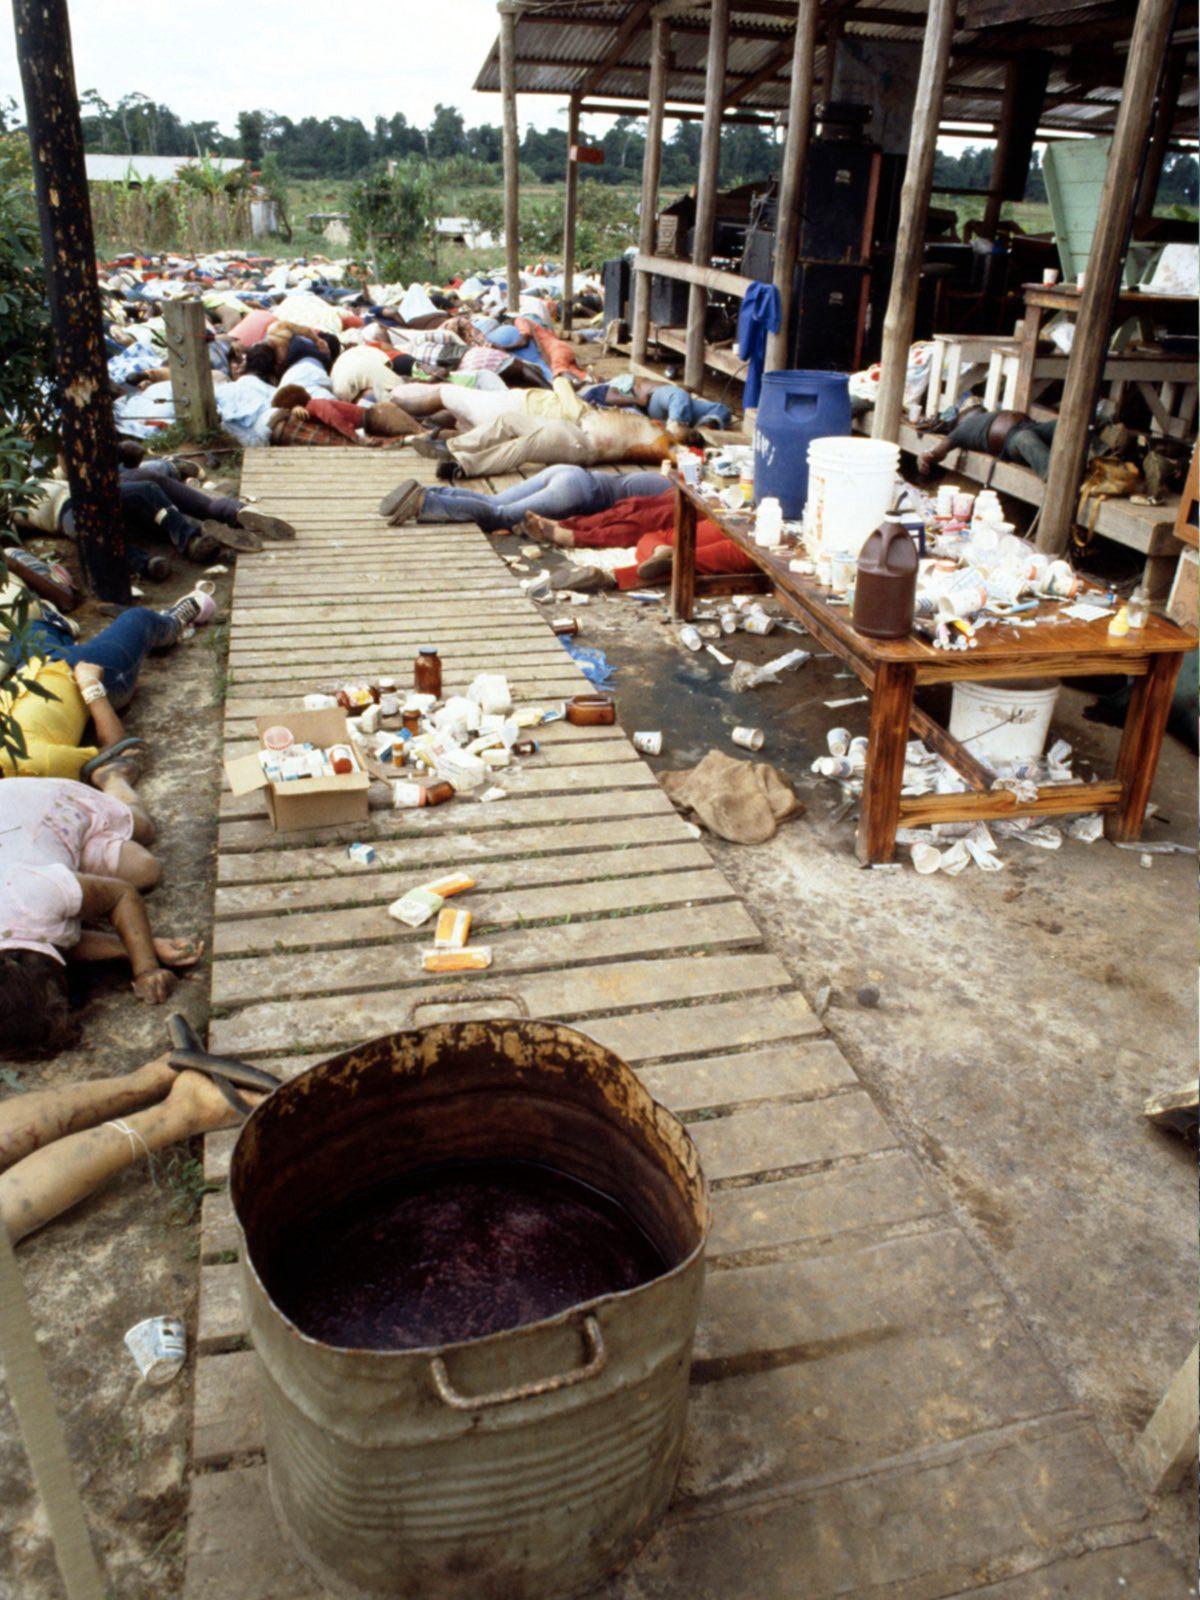 jonestown-victims-army-photo